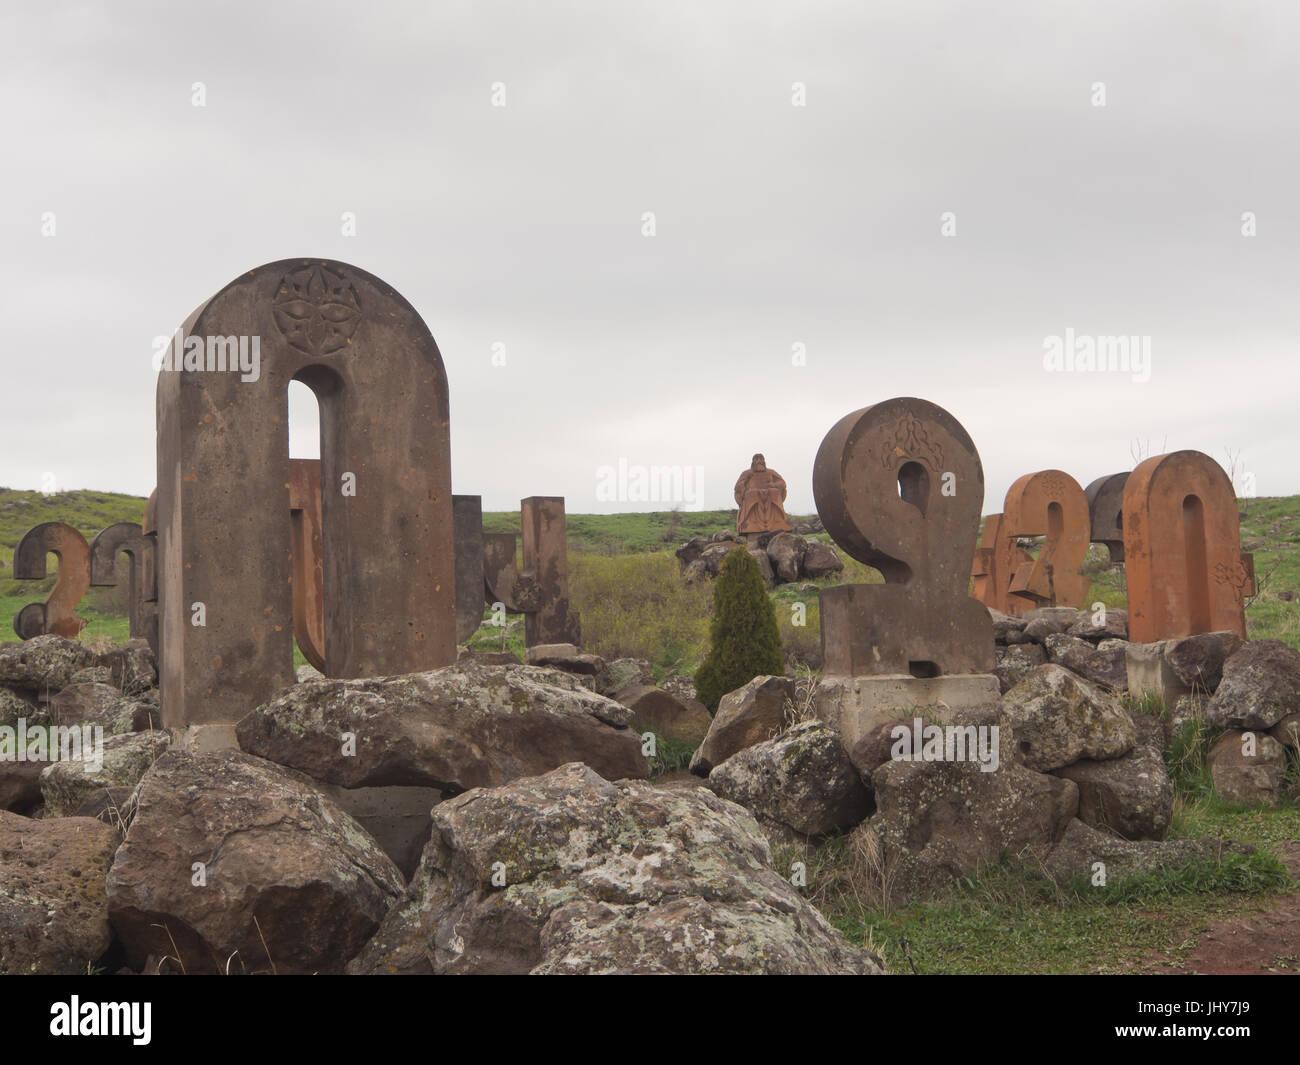 libanais arménien datant